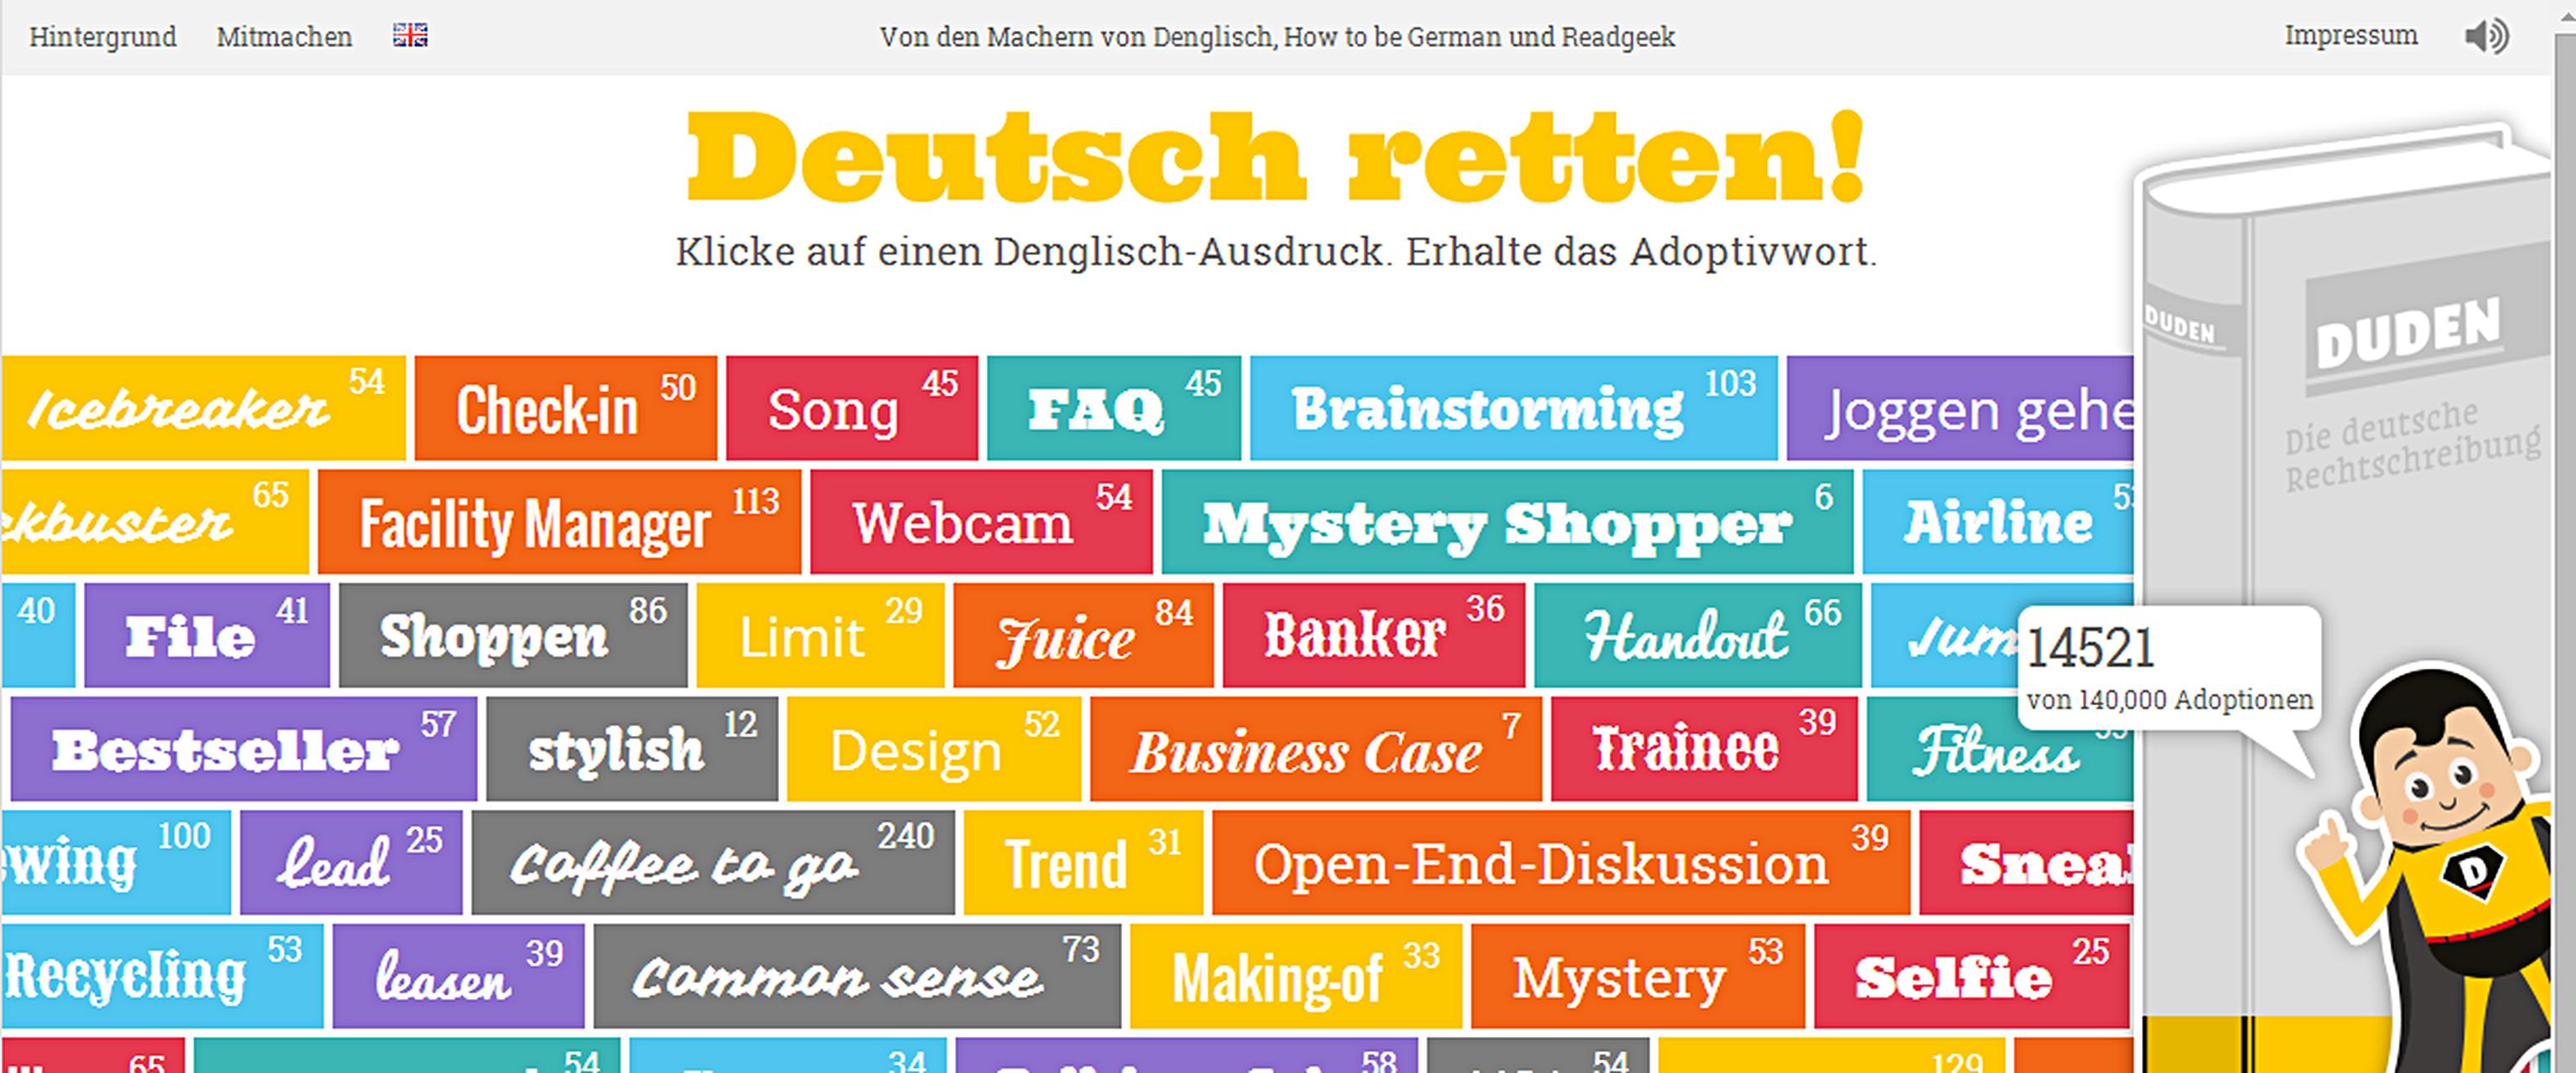 deutschretten.com: Anglizismen vermeiden